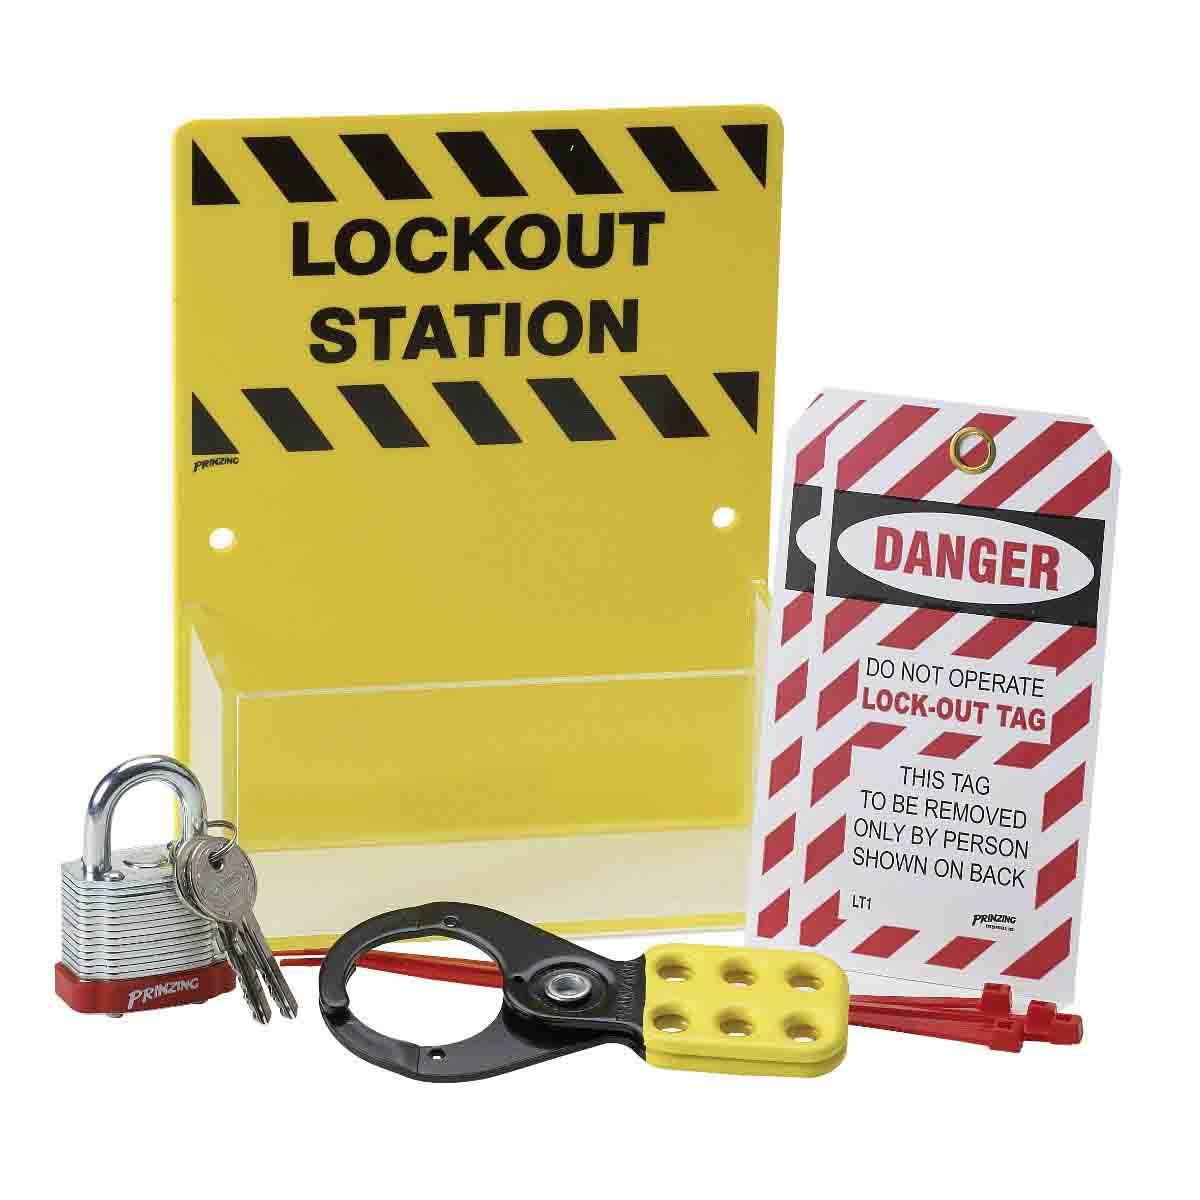 Brady® 65679 Padlock Center Lockout Station Only, 10 Padlocks, 19 in H x 12 in W, Wall Mount, Language: English